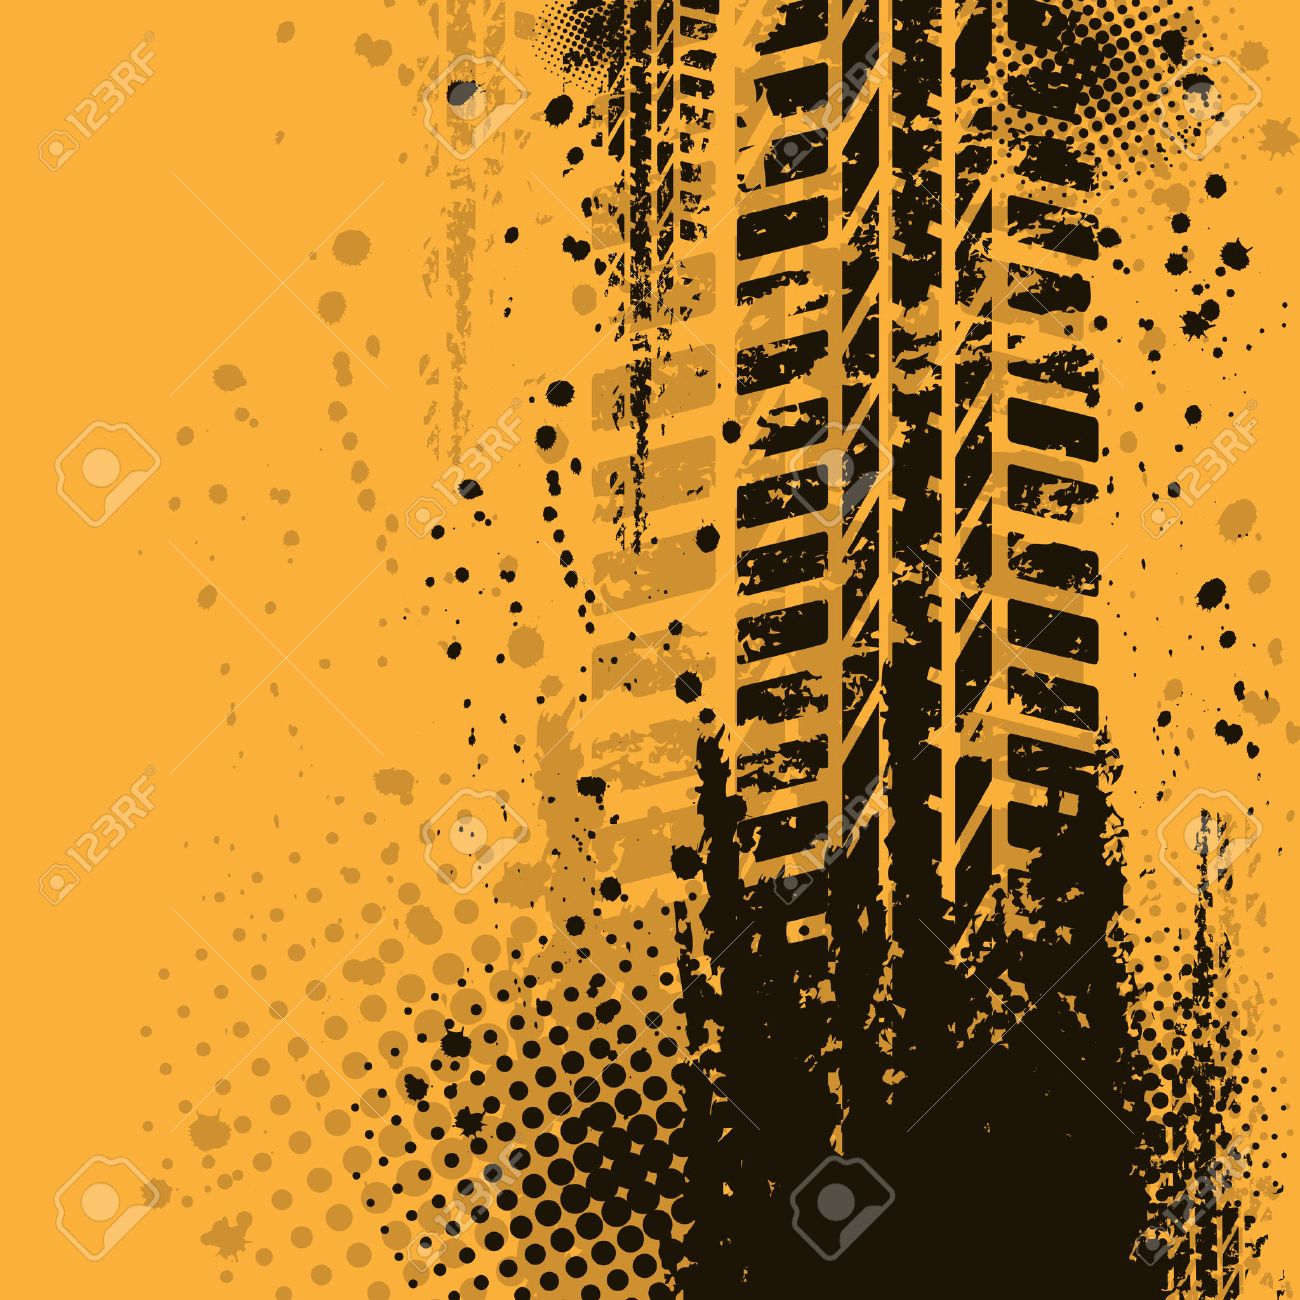 Orange grunge background with black tire track. eps10 Stock Vector - 23469759